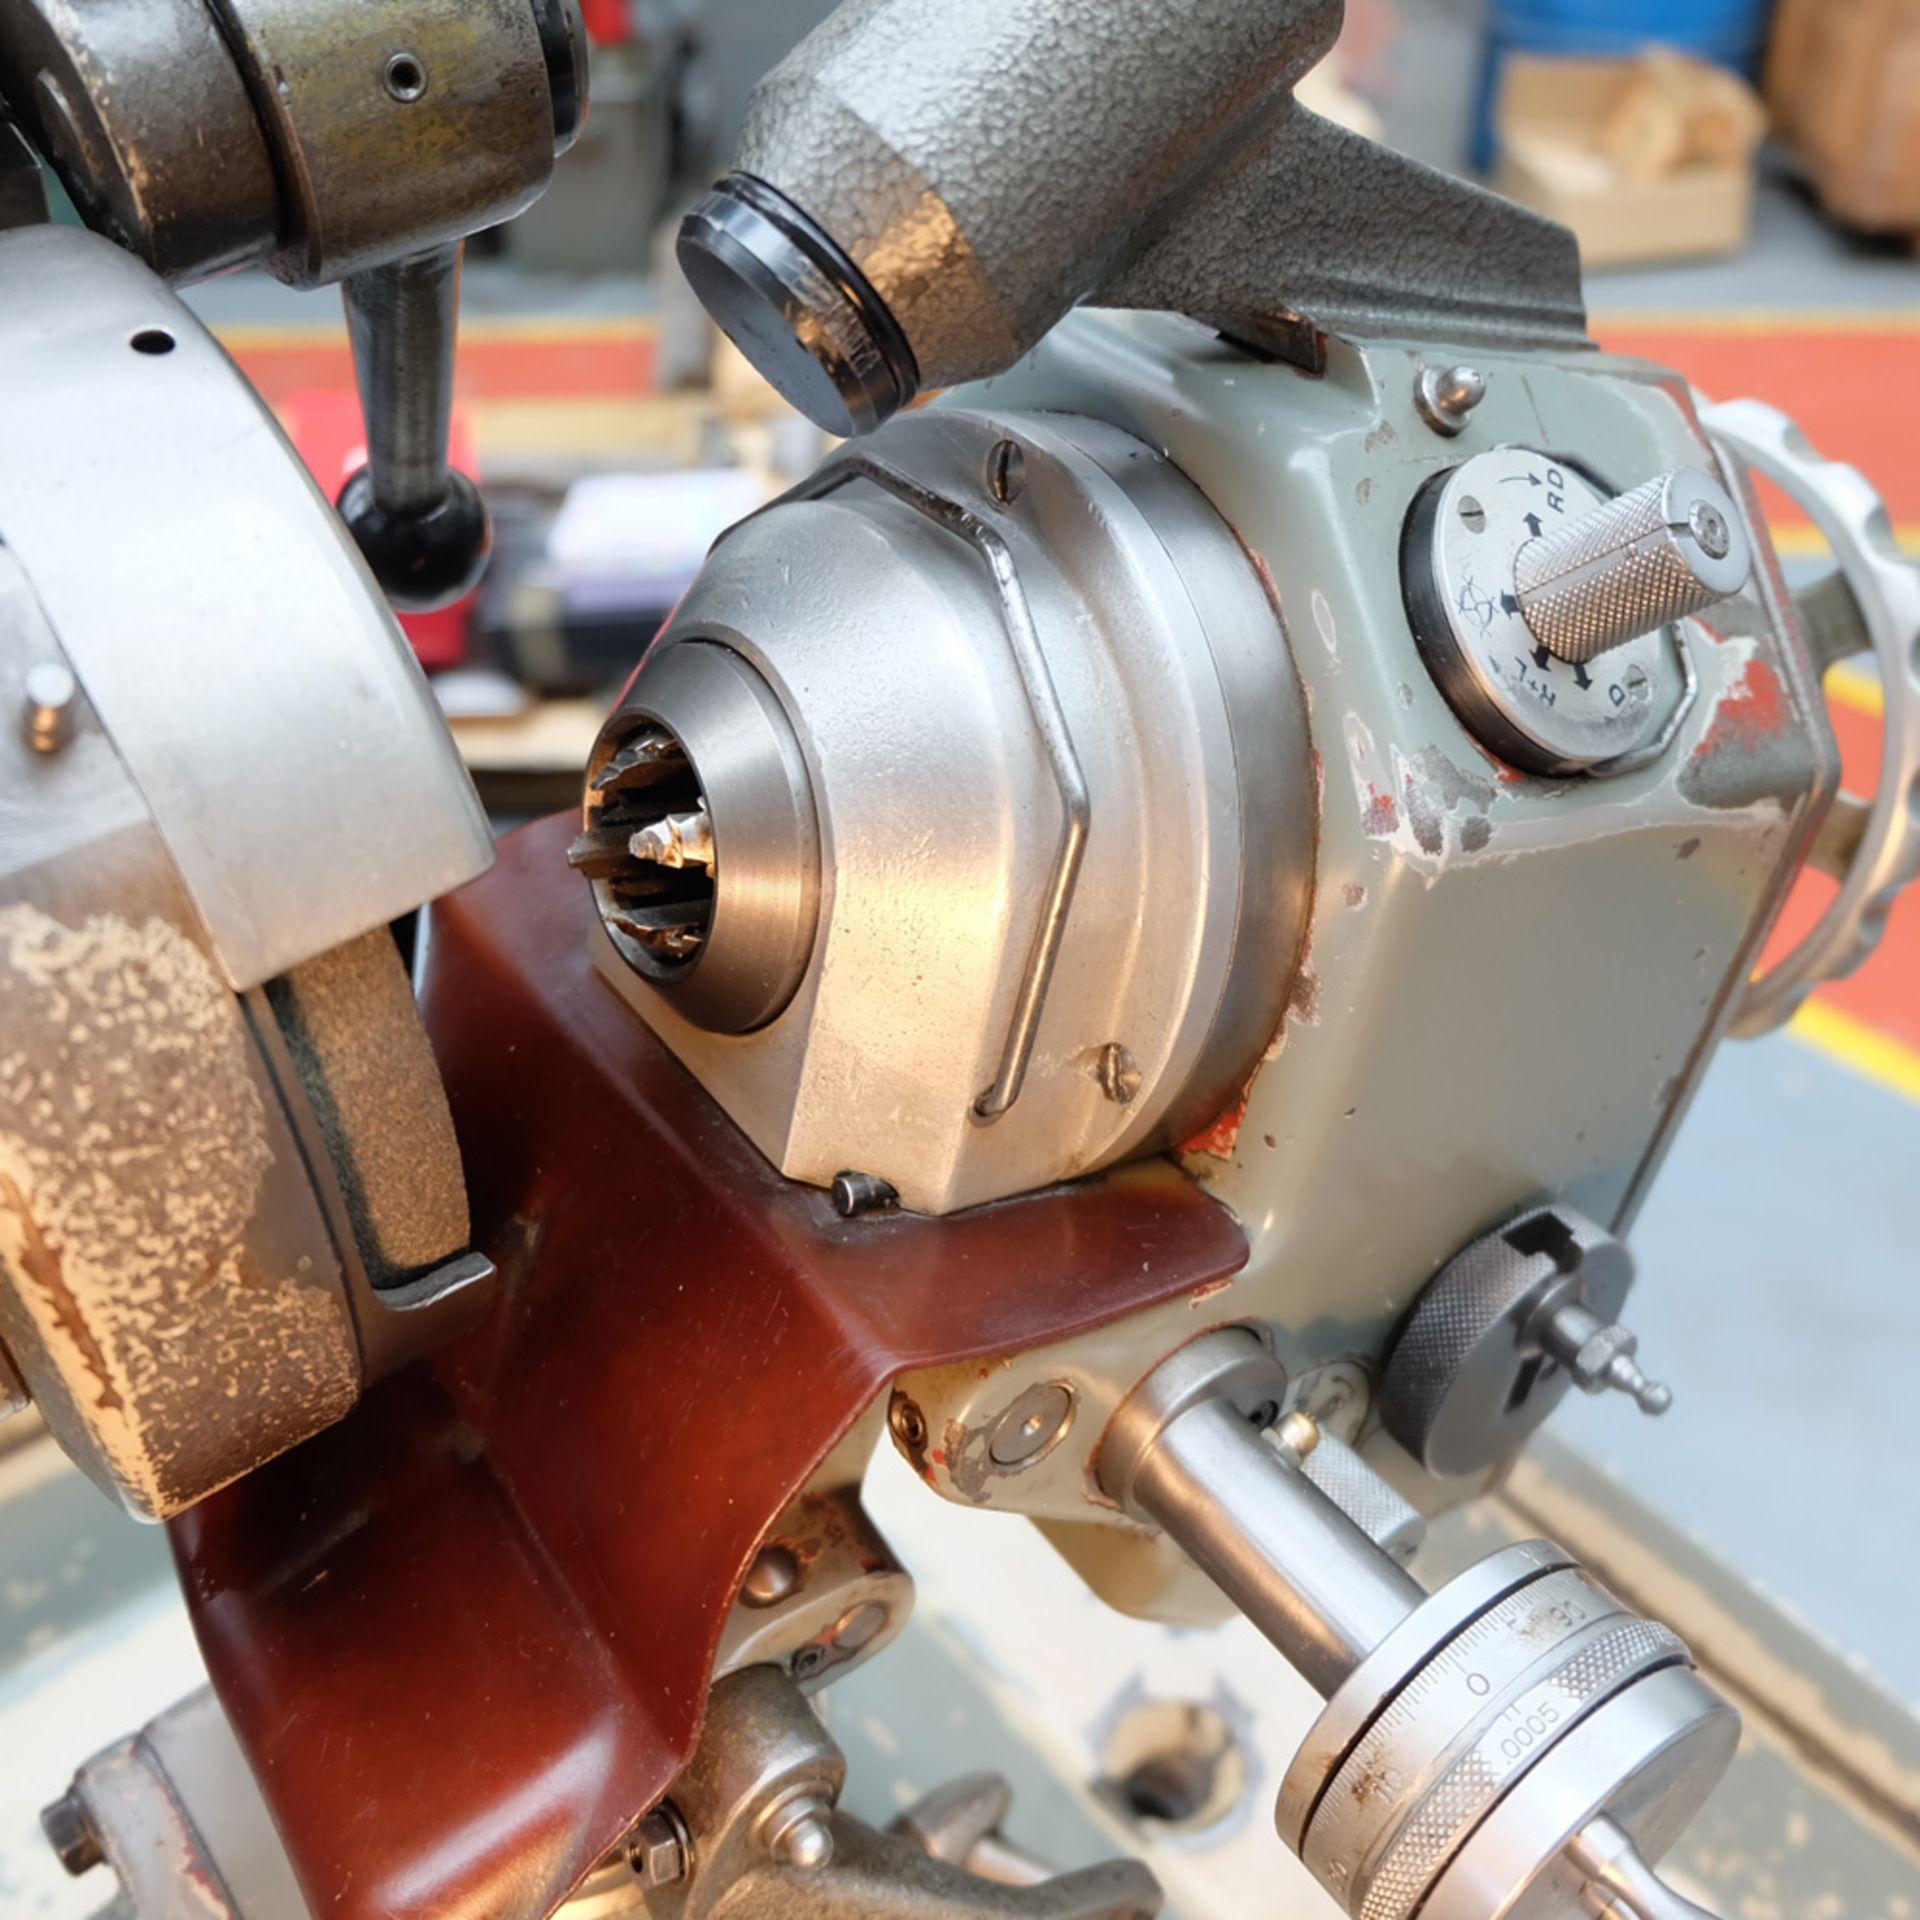 Christen Type 2-32 Twist Drill Grinding Machine. - Image 7 of 14